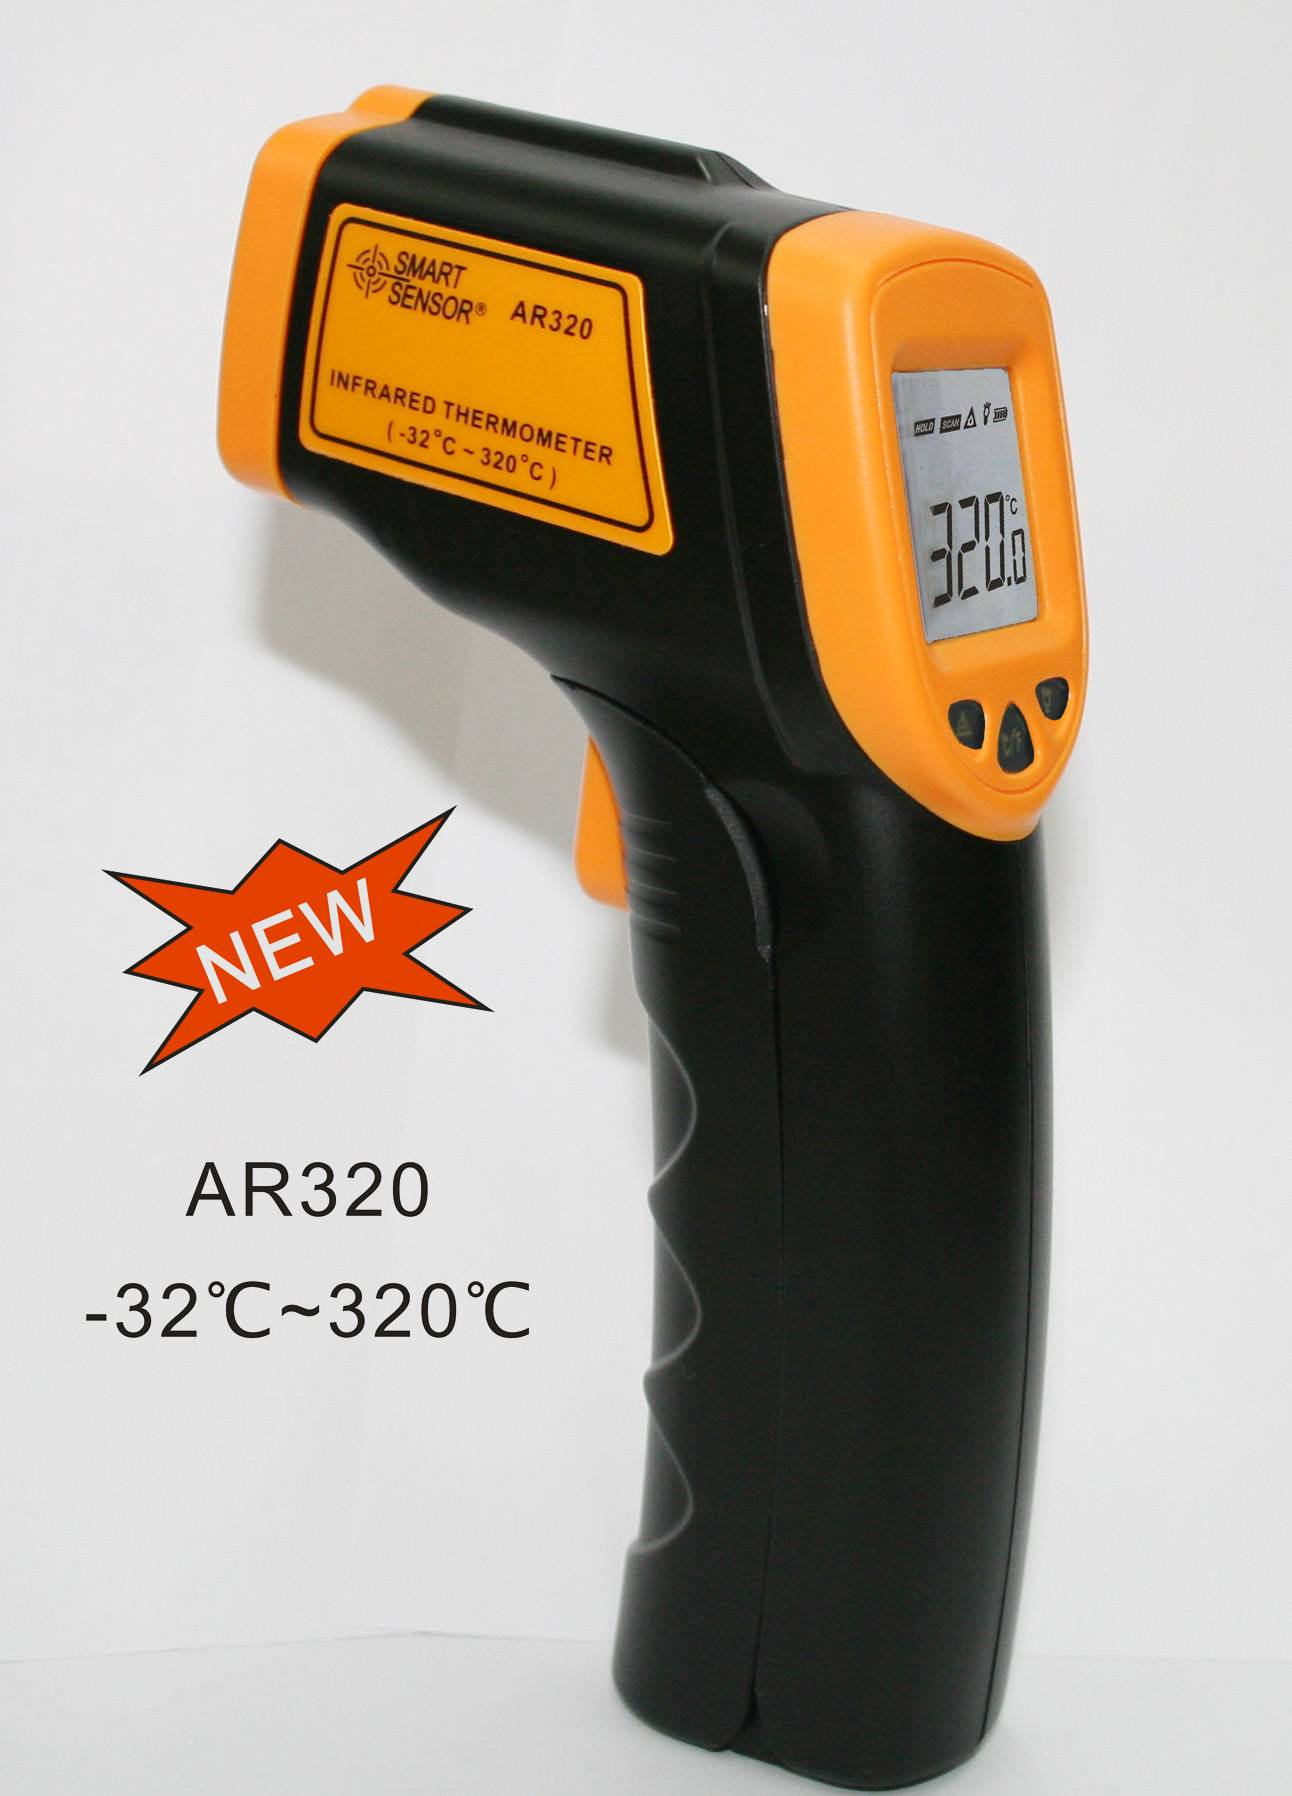 Smart Sensor IR Thermometer AR320